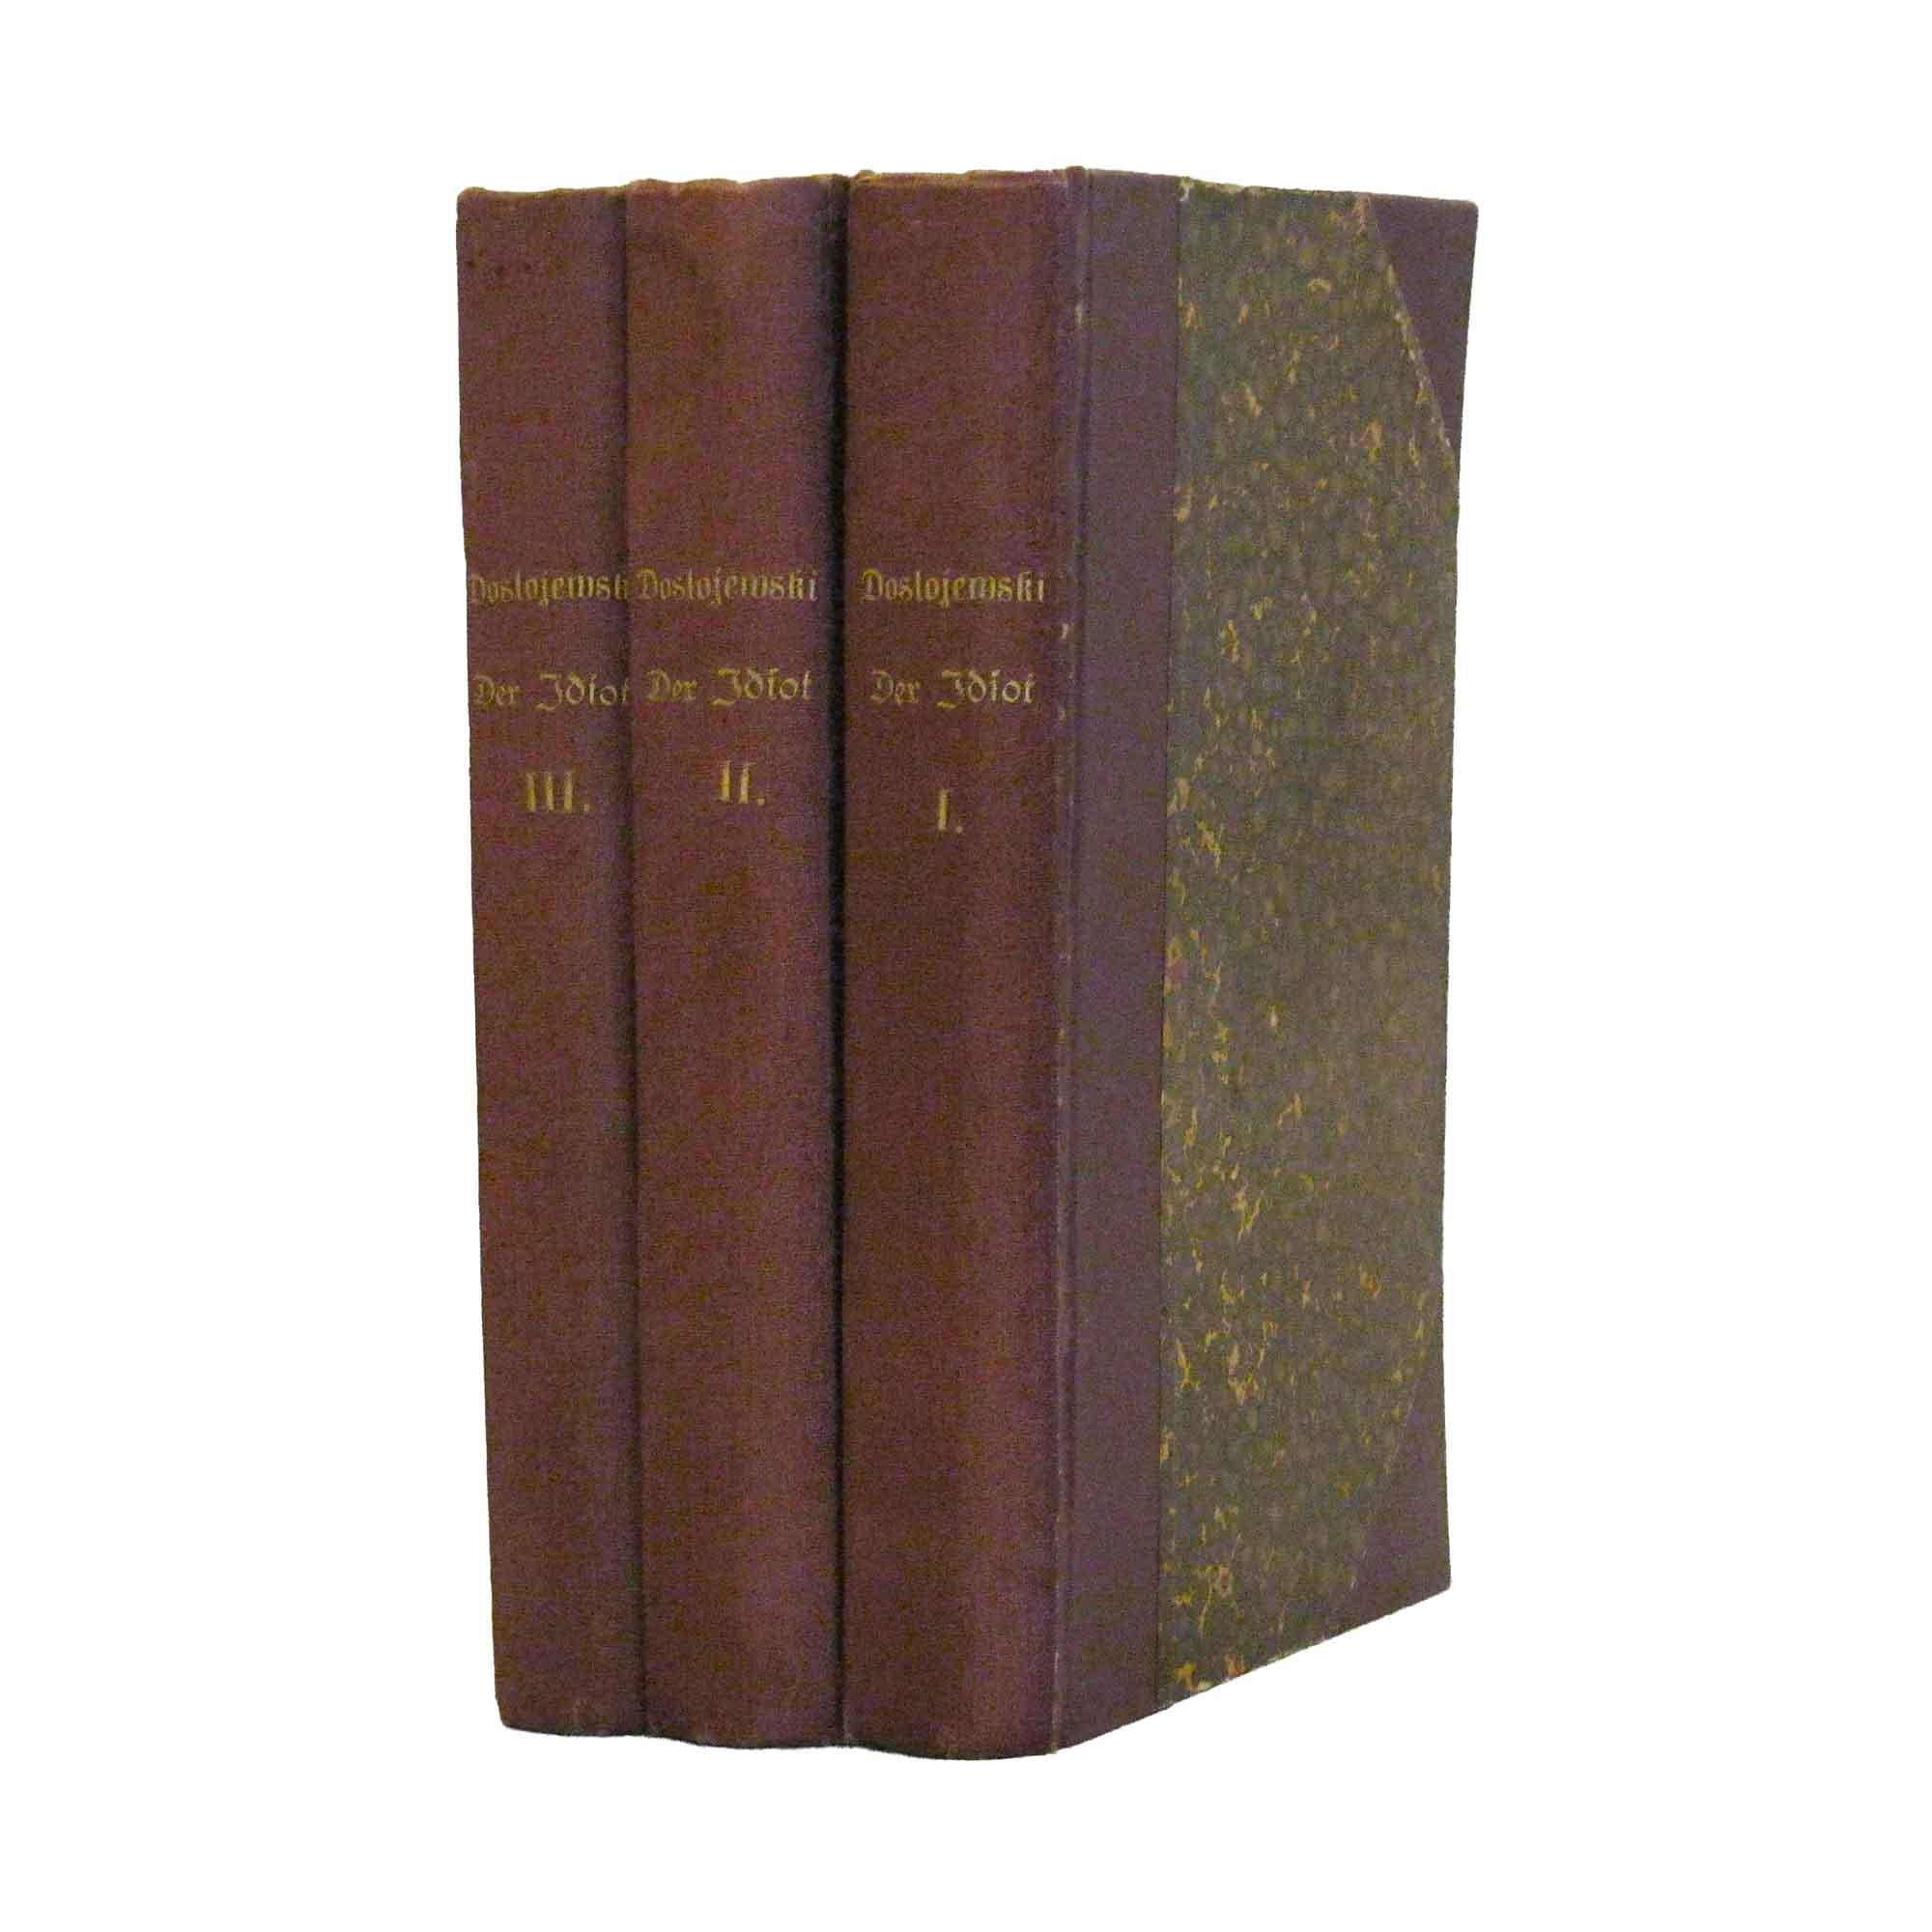 5341-Dostojewski-Idiot-1889-Einbände-frei-N.jpg